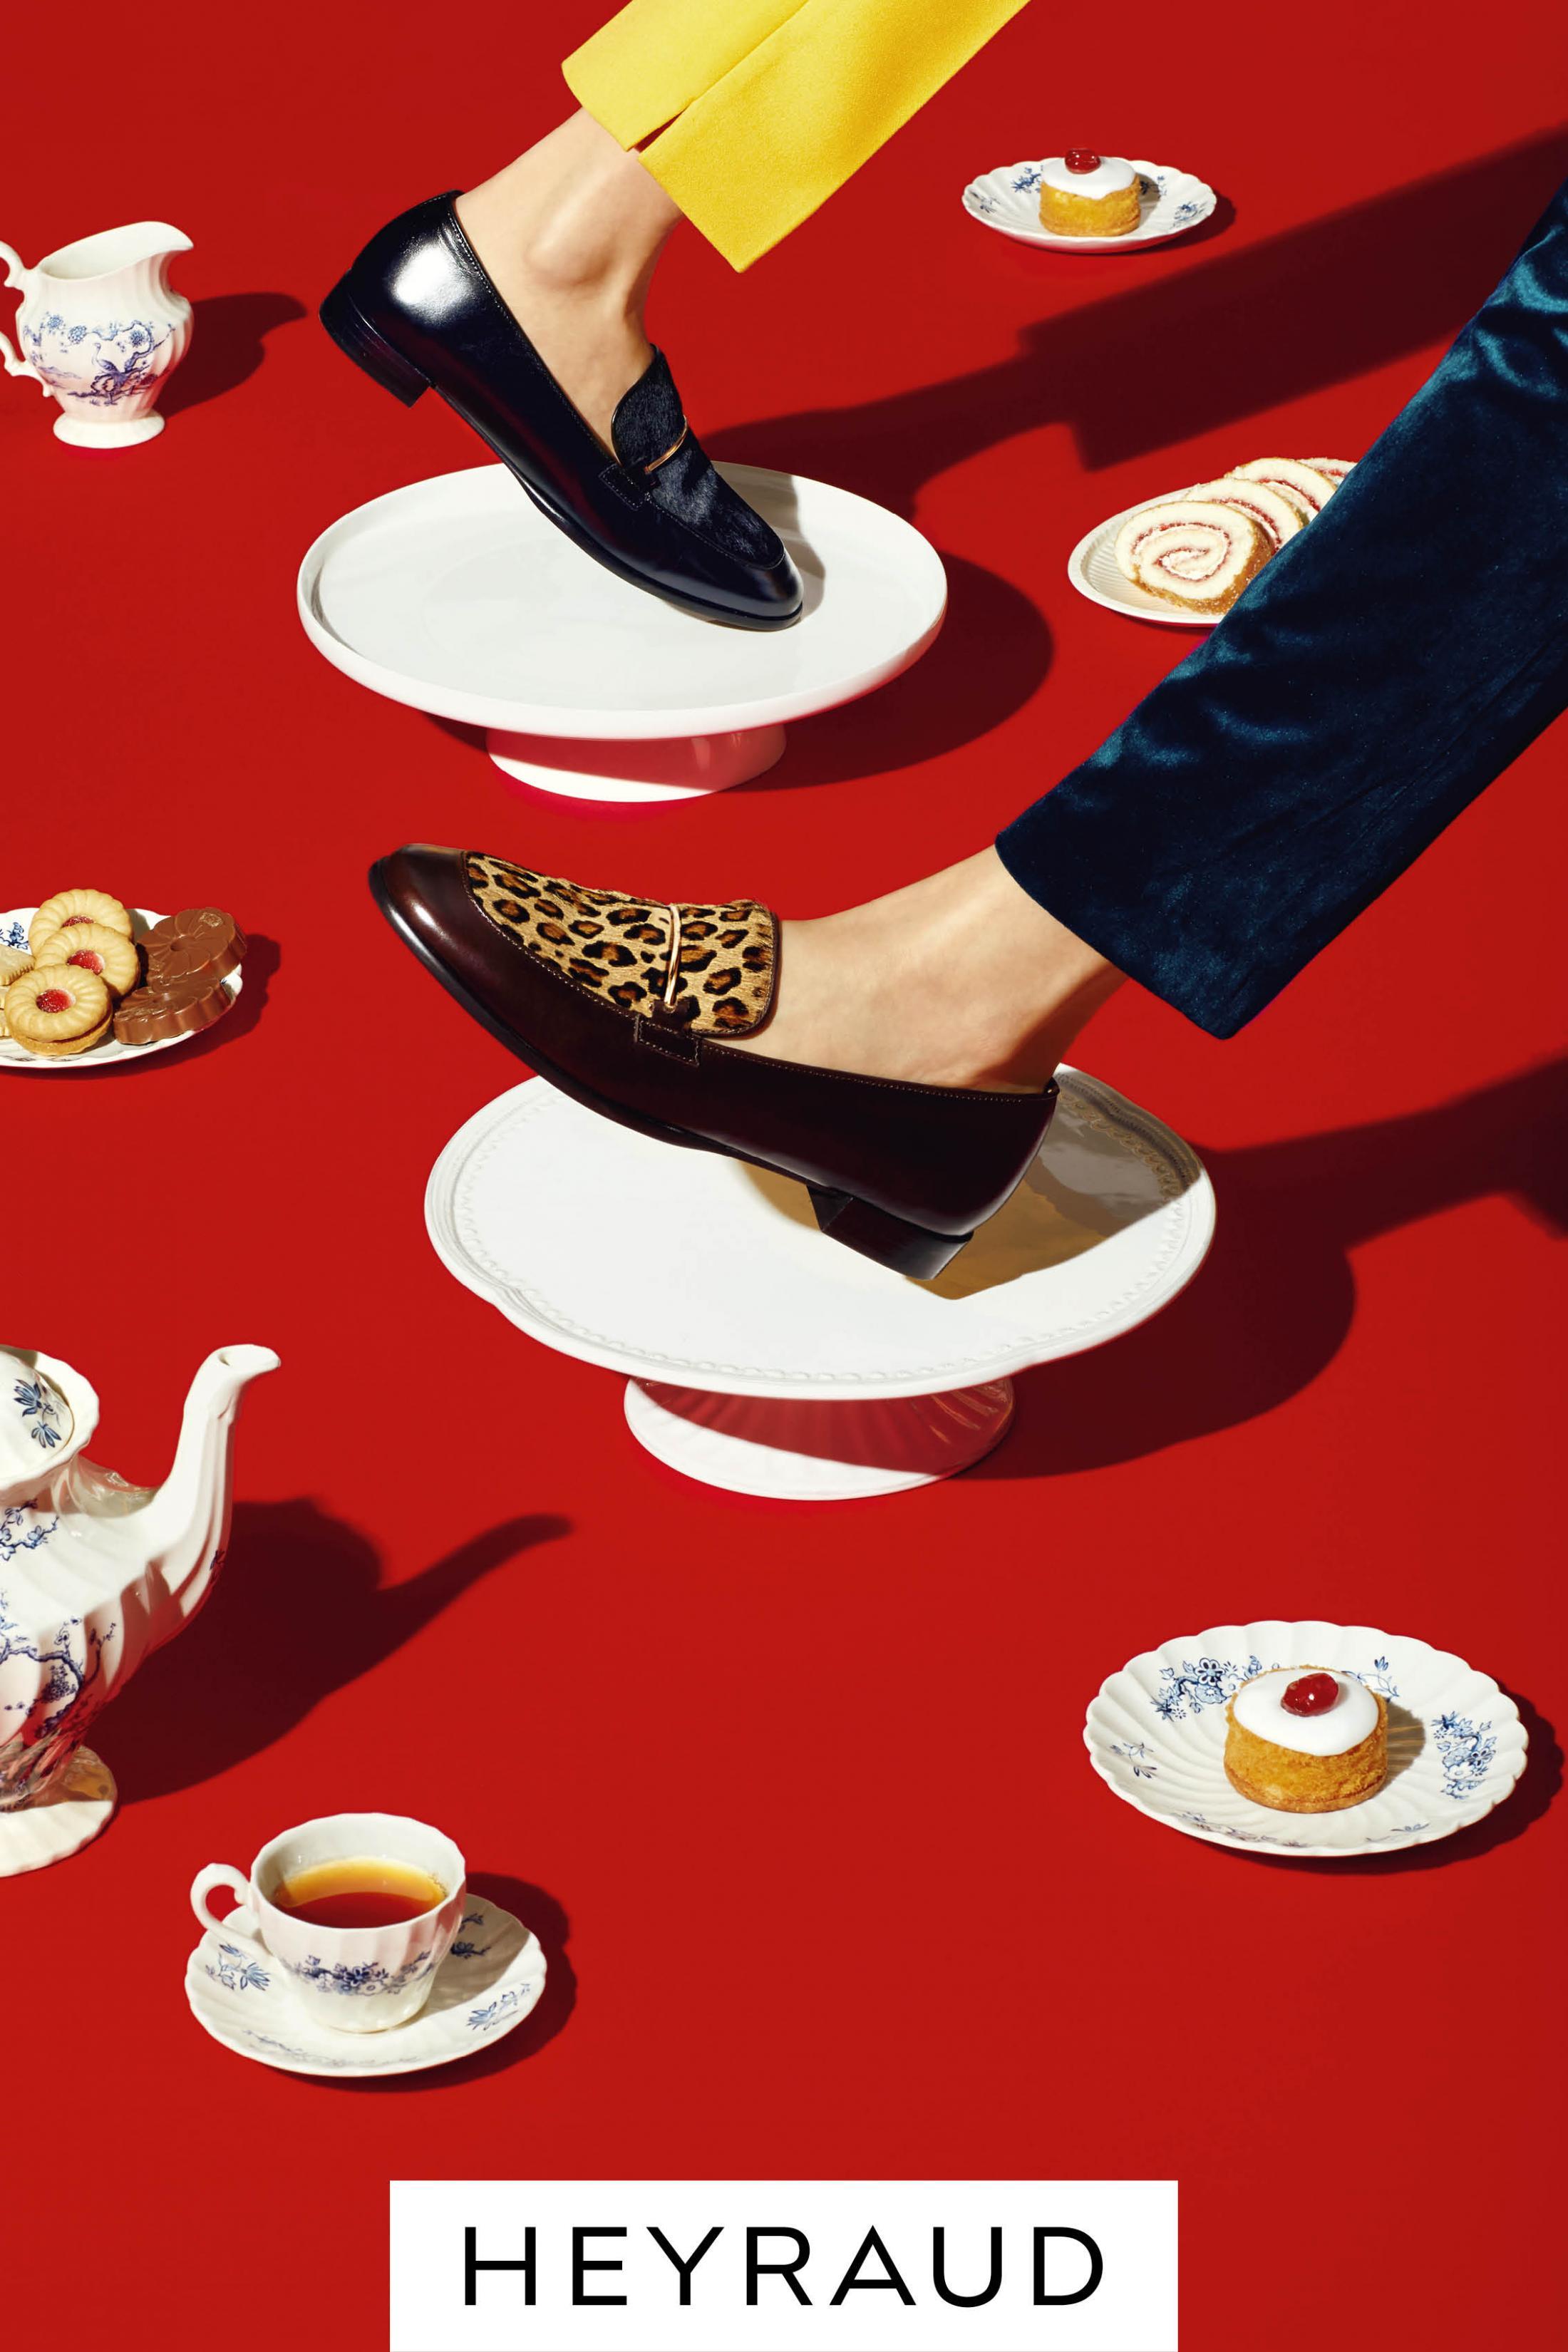 Heyraud Outdoor Ad - Autumn / Winter Collection